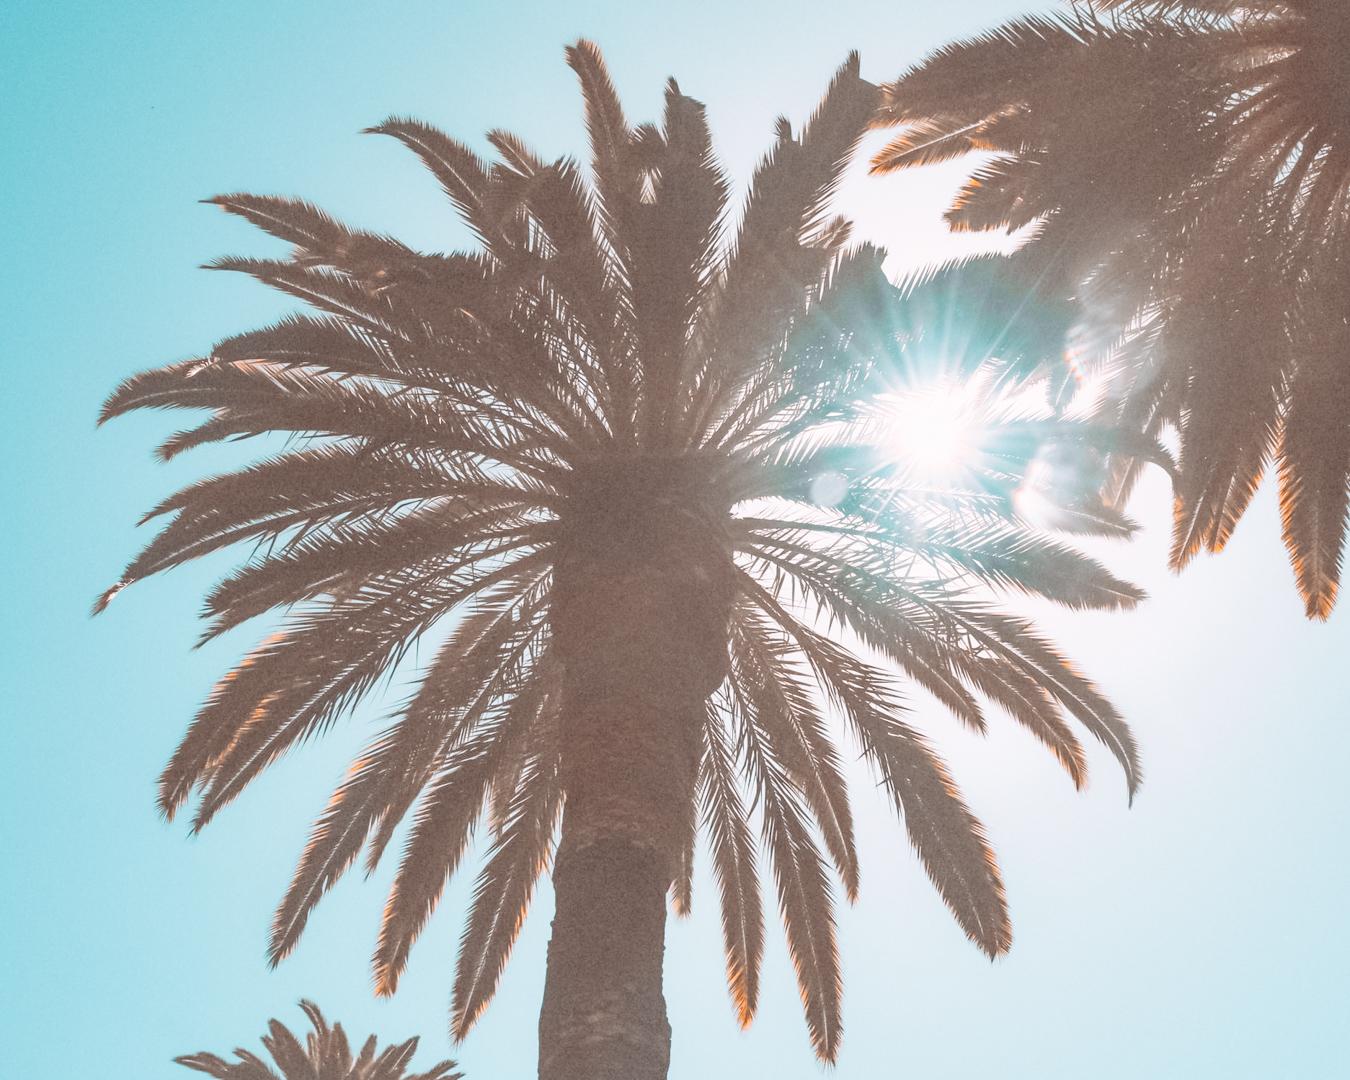 Palm trees in San Jose